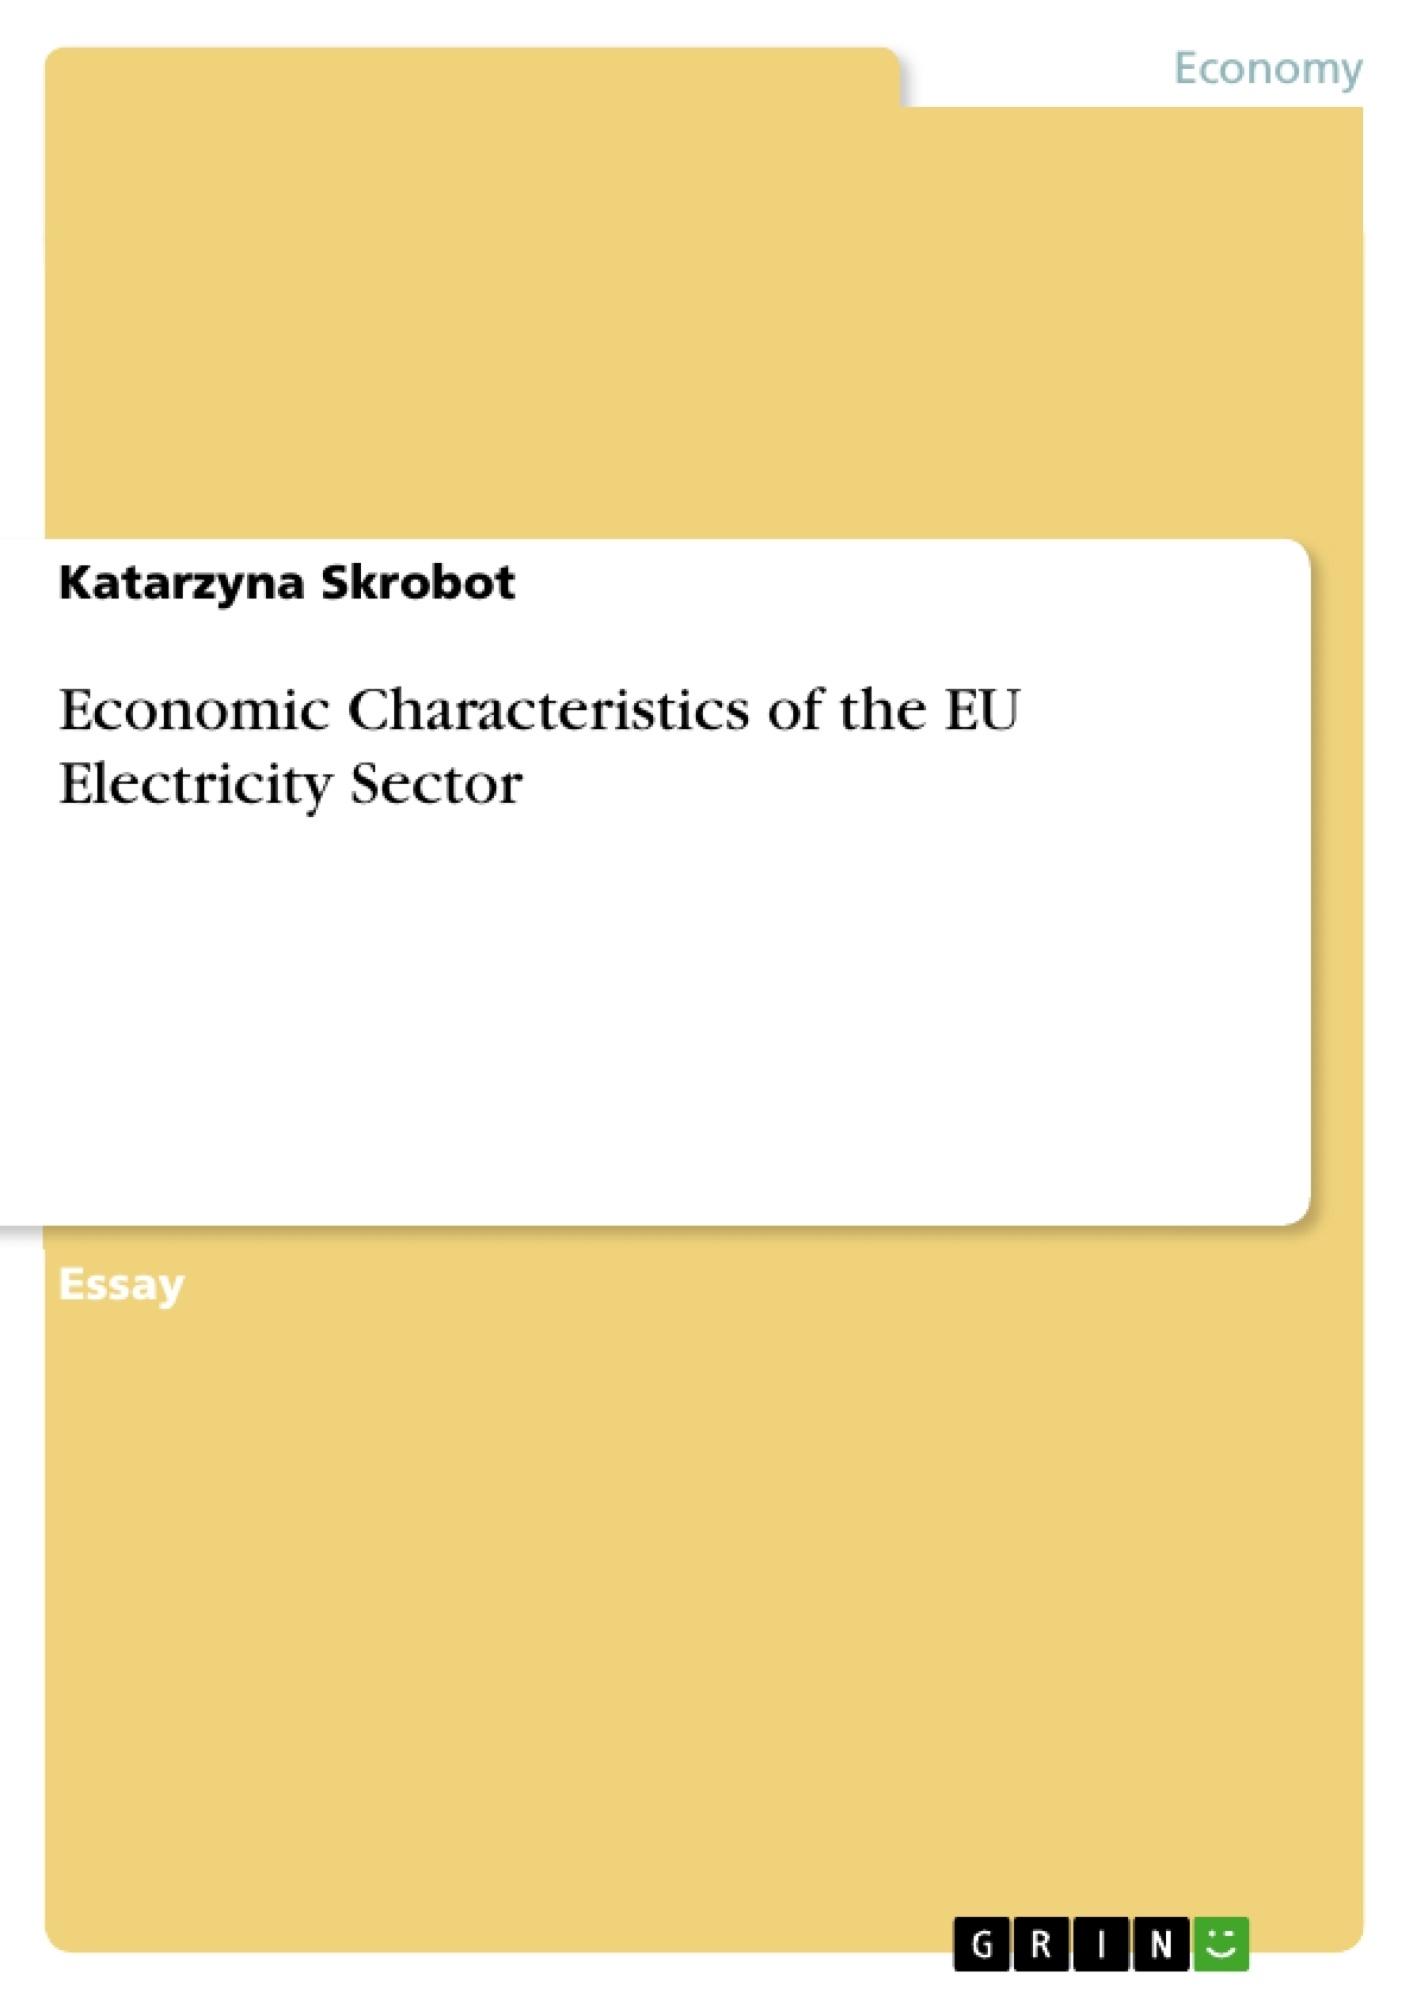 Title: Economic Characteristics of the EU Electricity Sector